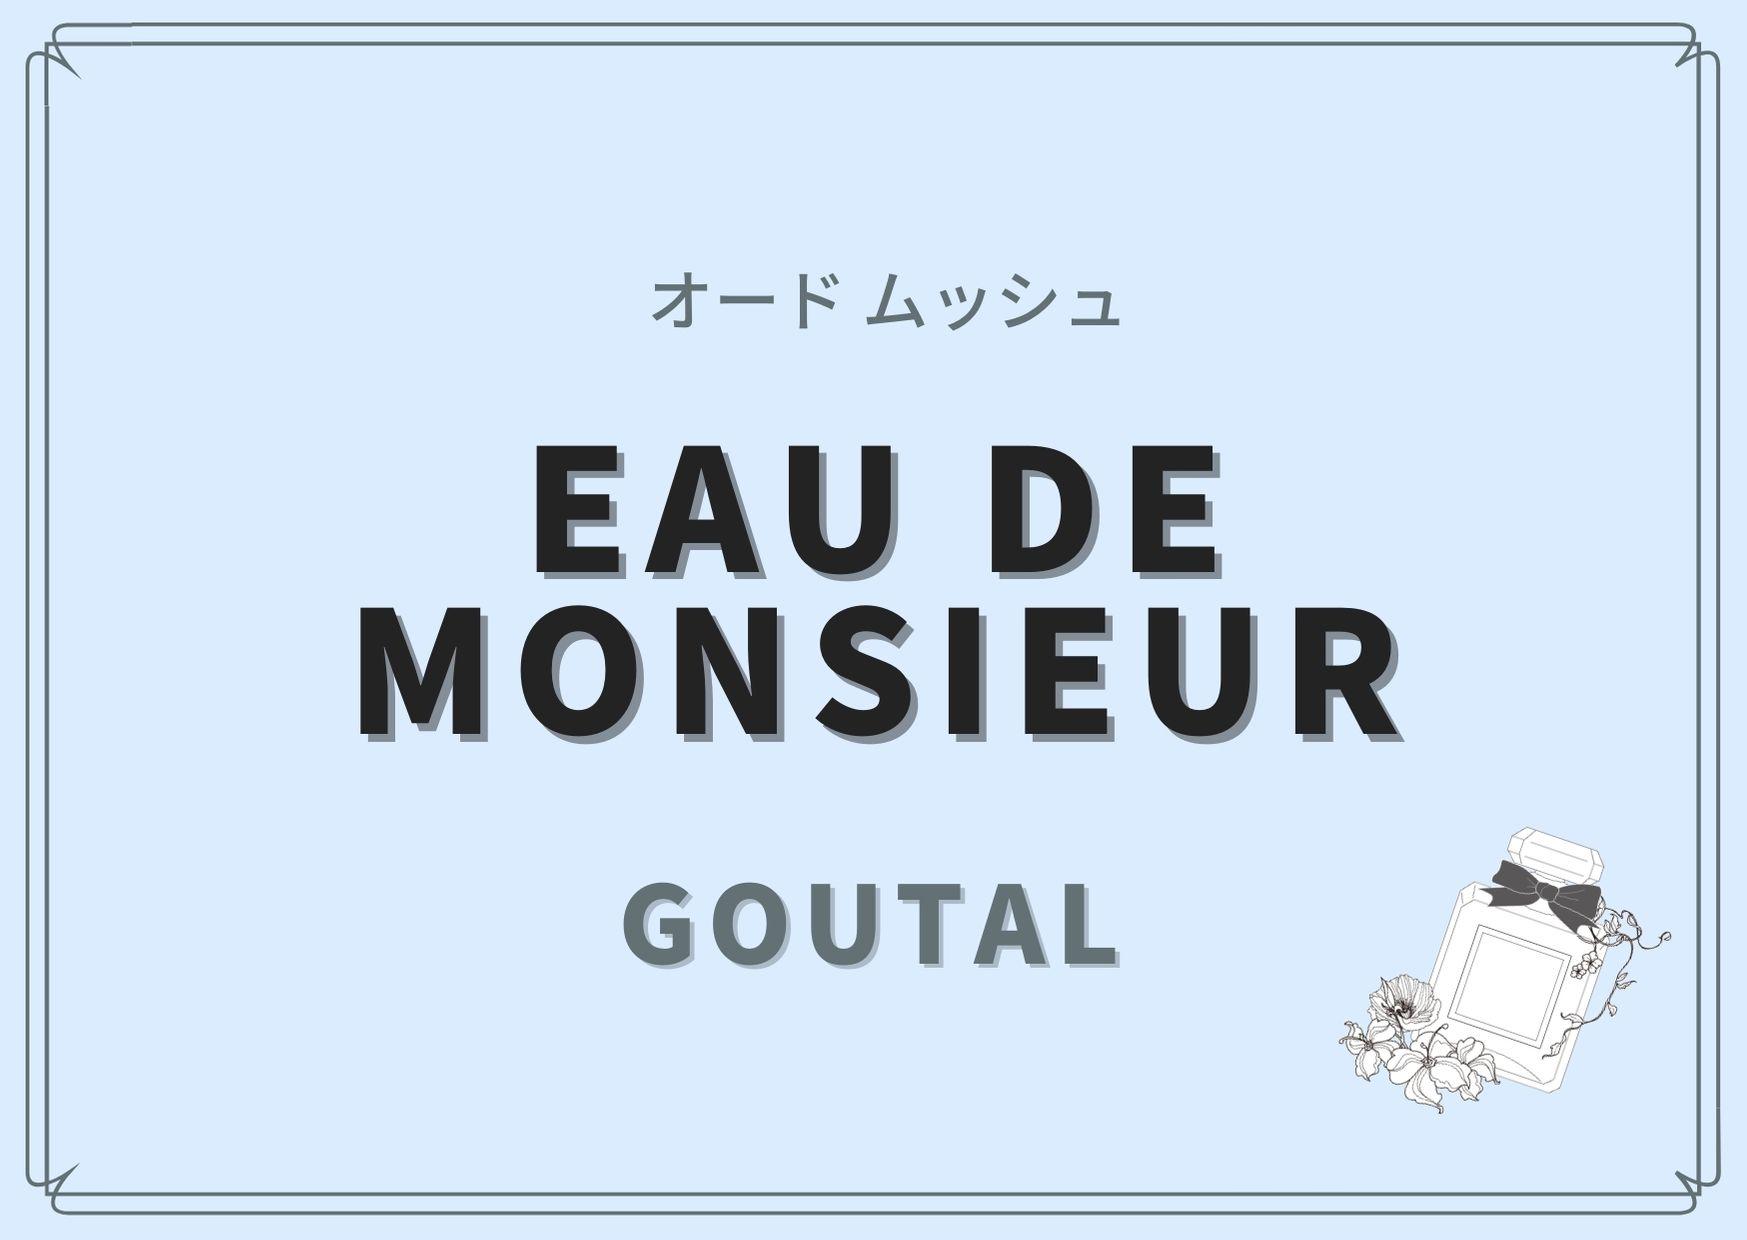 EAU DE MONSIEUR(オード ムッシュ)/ANNICK GOUTAL(アニック グタール)